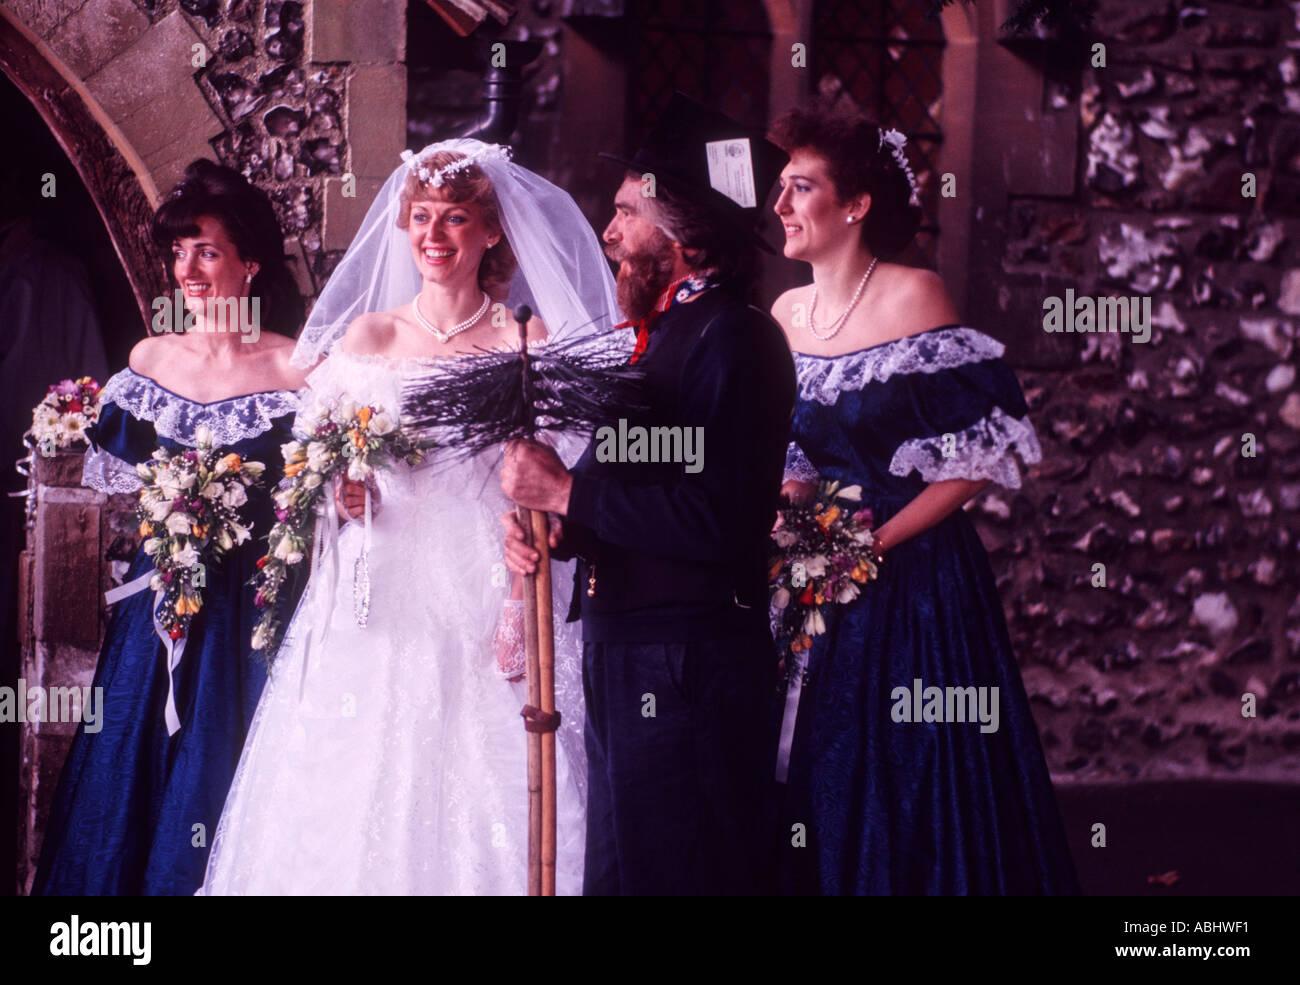 1980s Bride Stock Photos & 1980s Bride Stock Images - Alamy